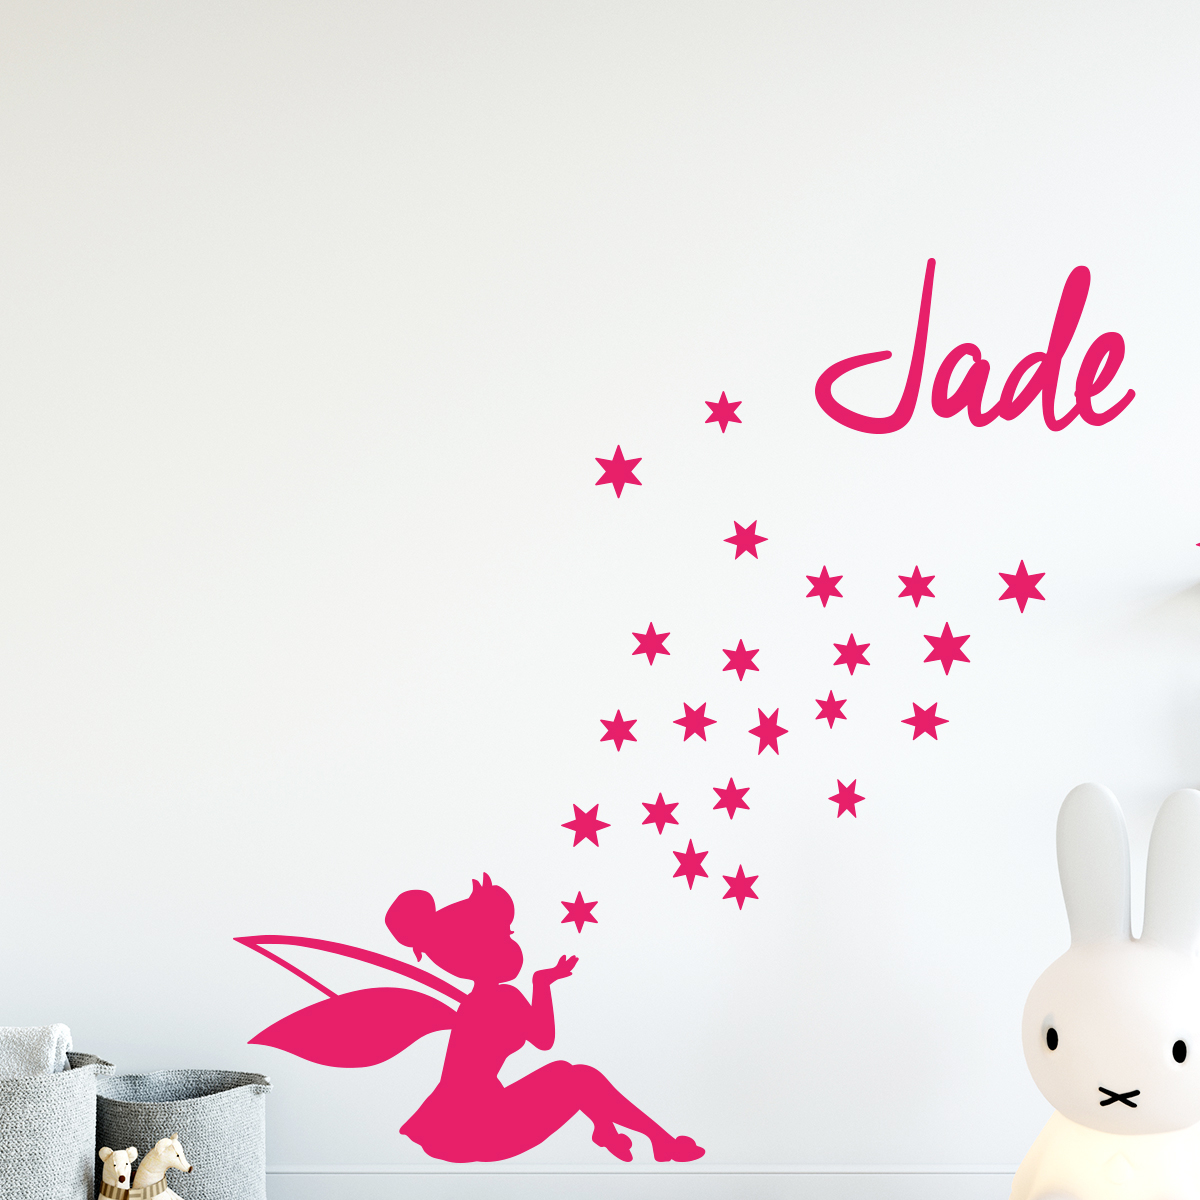 sticker pr nom personnalisable f e soufflant les toiles. Black Bedroom Furniture Sets. Home Design Ideas